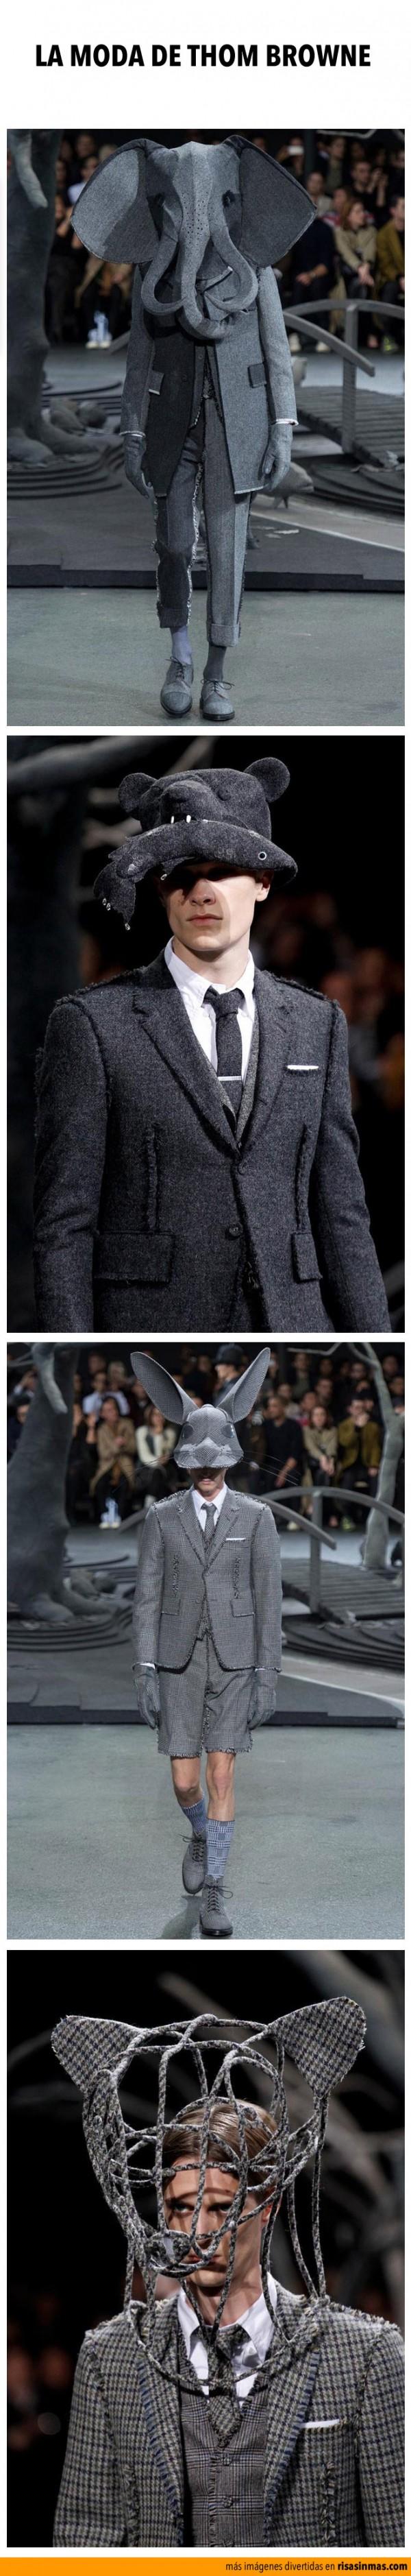 La moda de Thom Browne